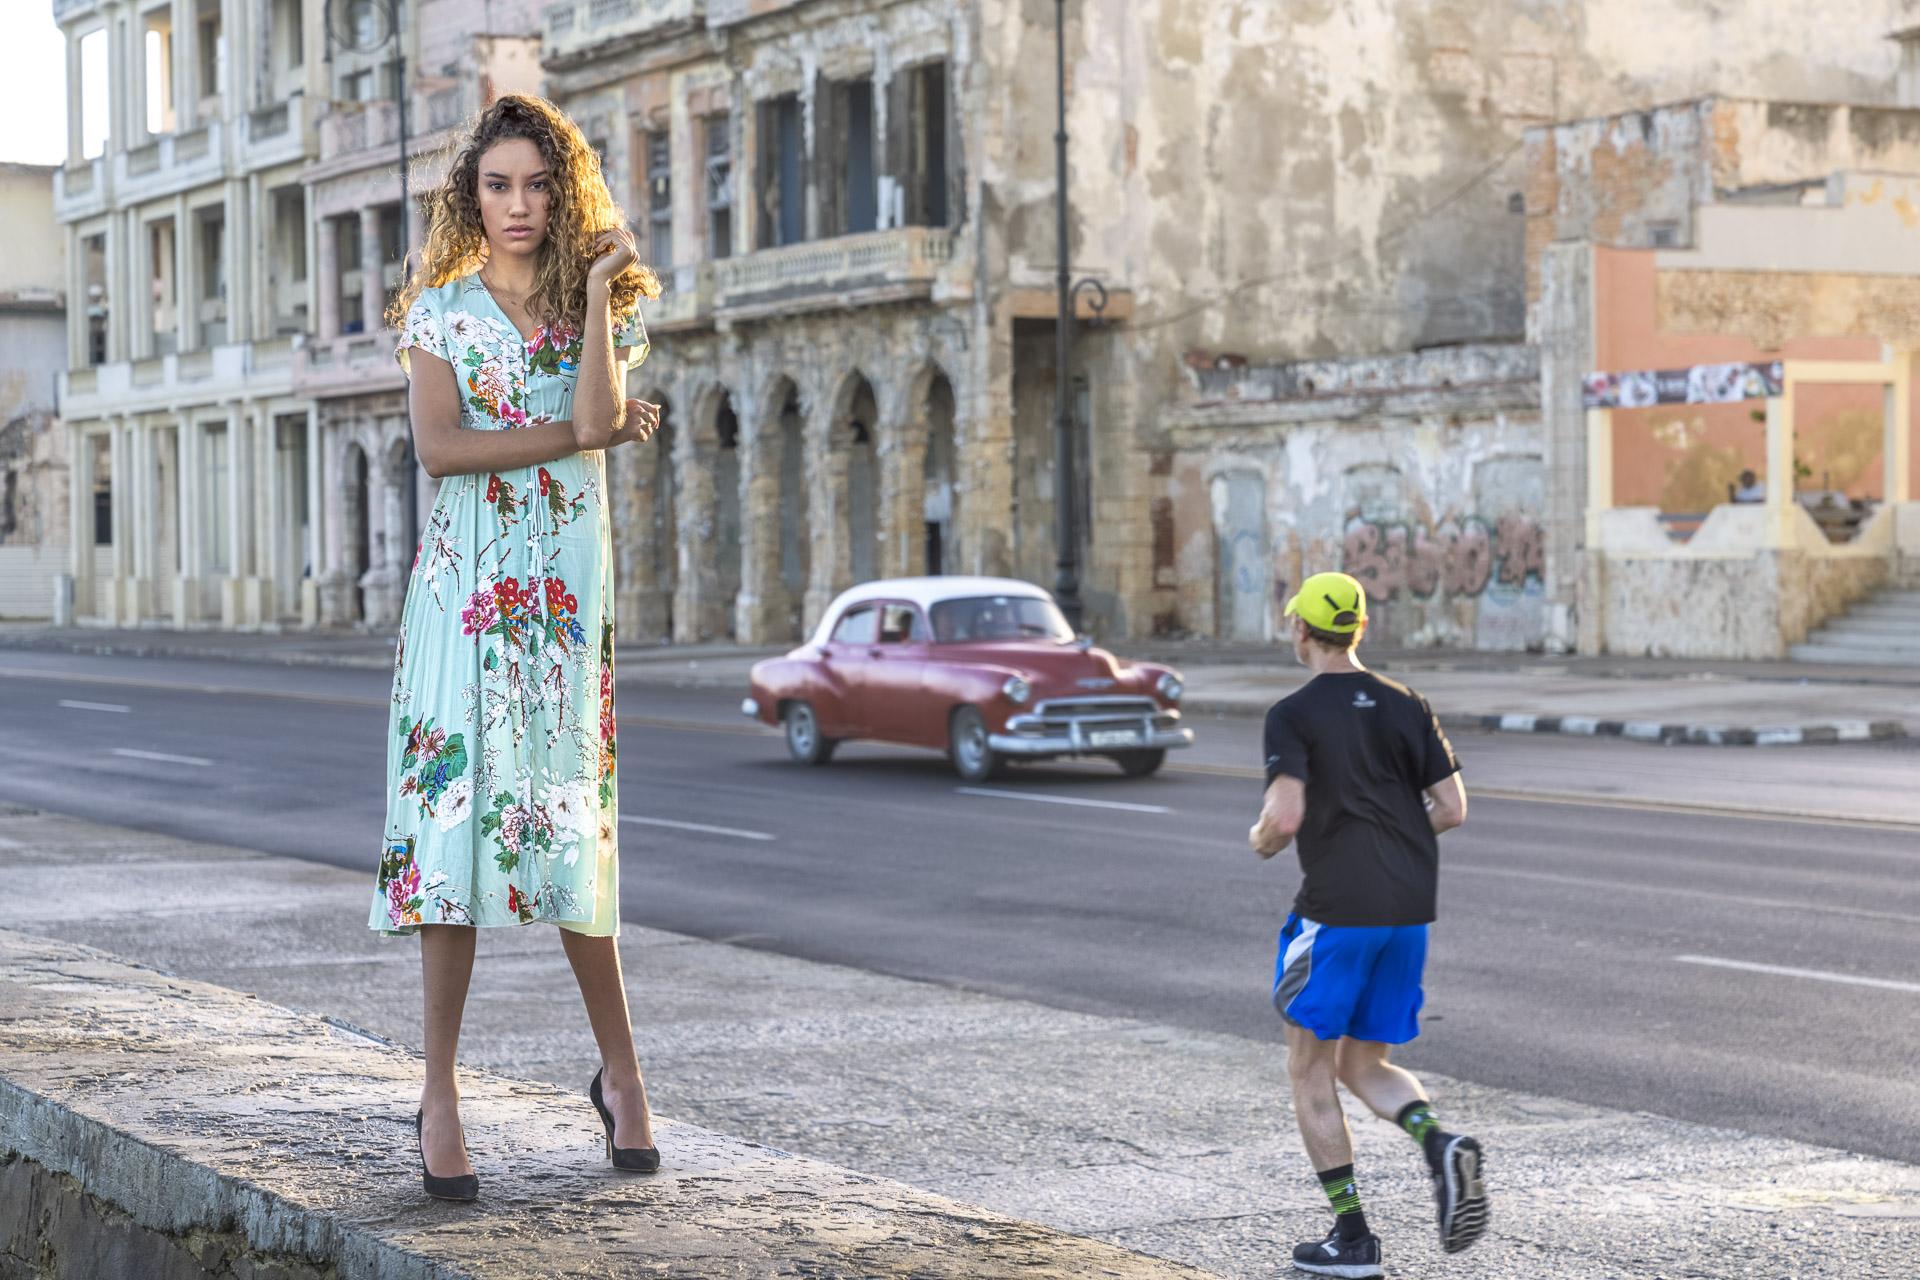 fotoreise-fotosafari-hd-2021-080-Kuba